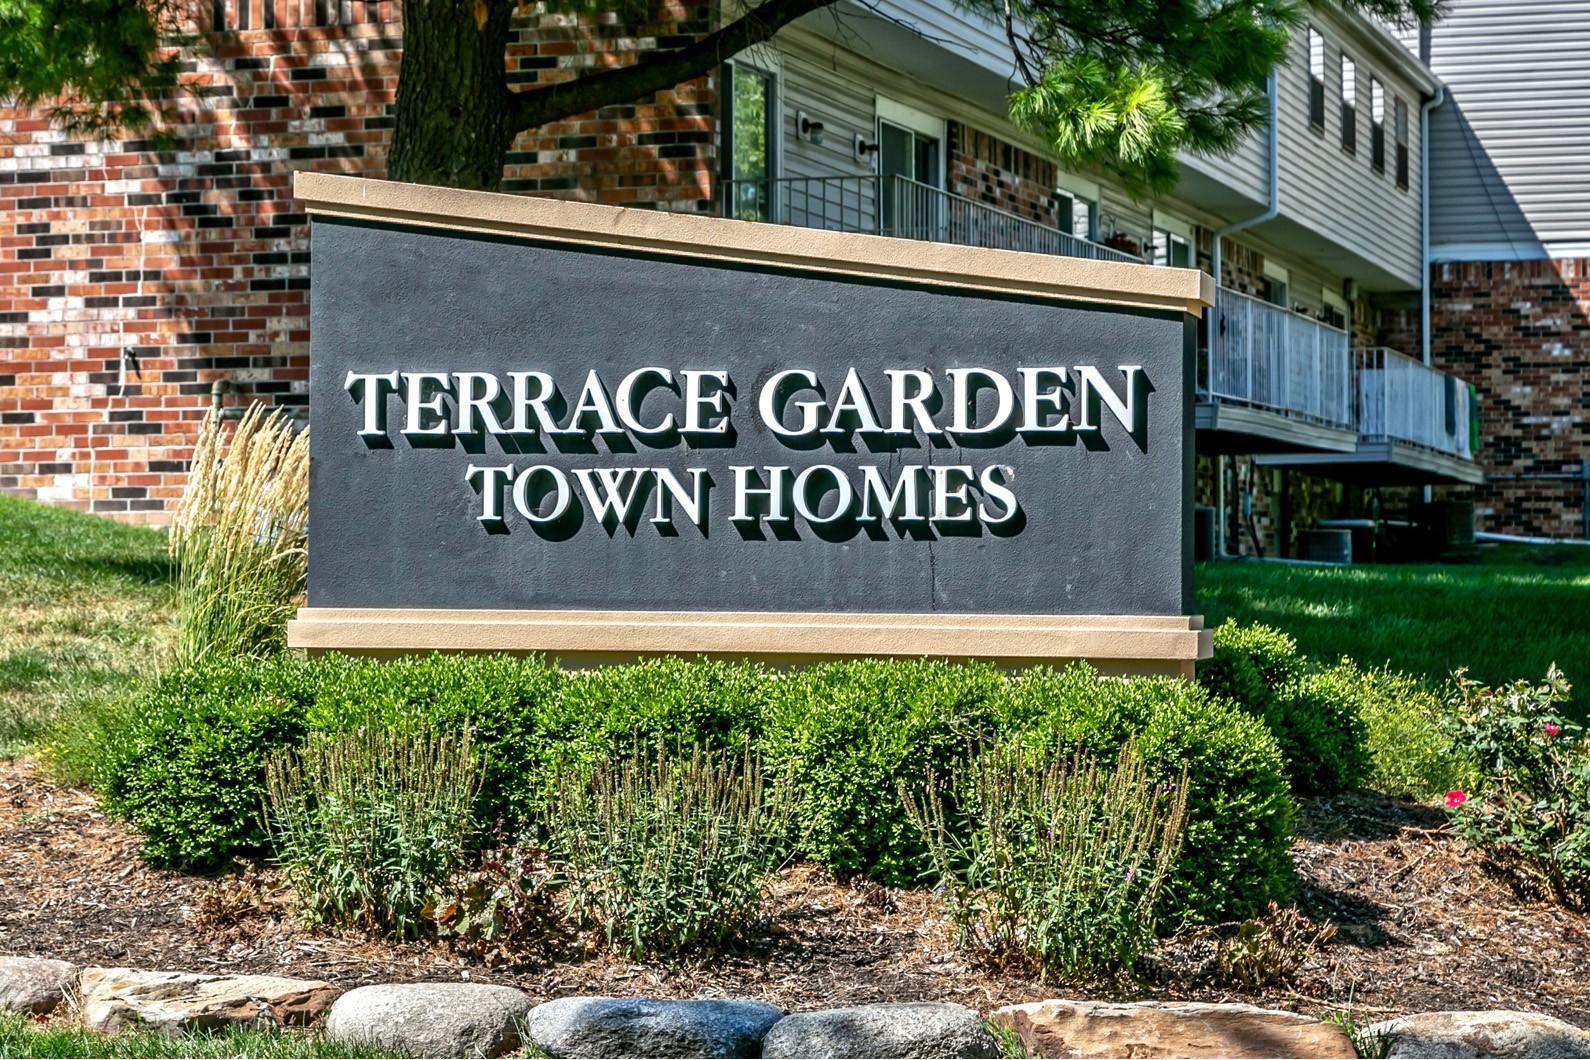 Apartments Near Nebraska Terrace Garden Townhomes for Nebraska Students in , NE